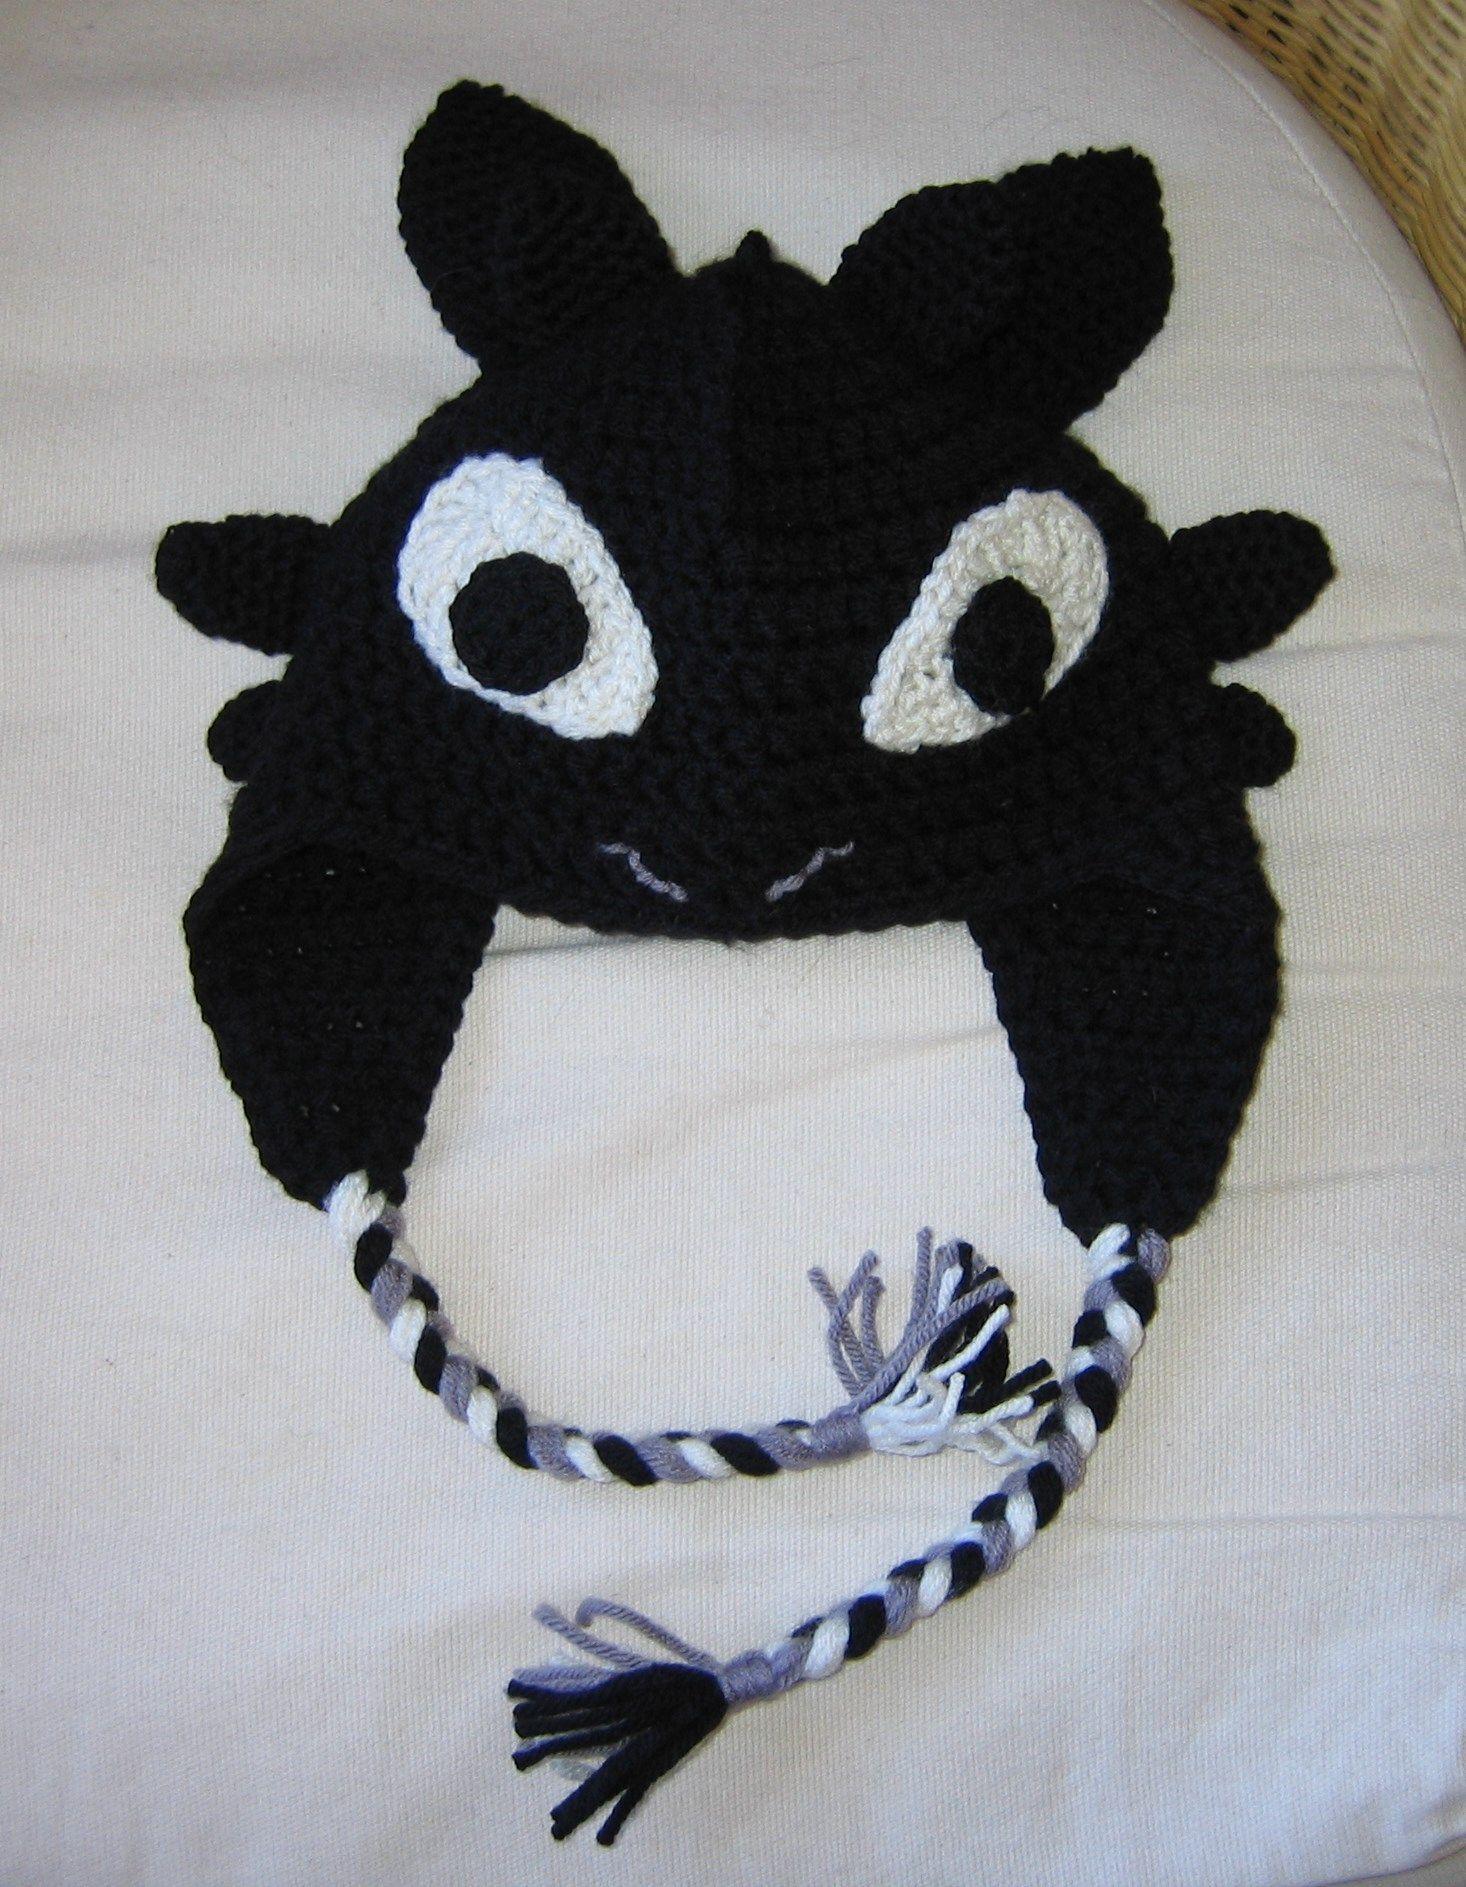 Crochet Toothless the Dragon hat | Dragon hats, Crochet ...